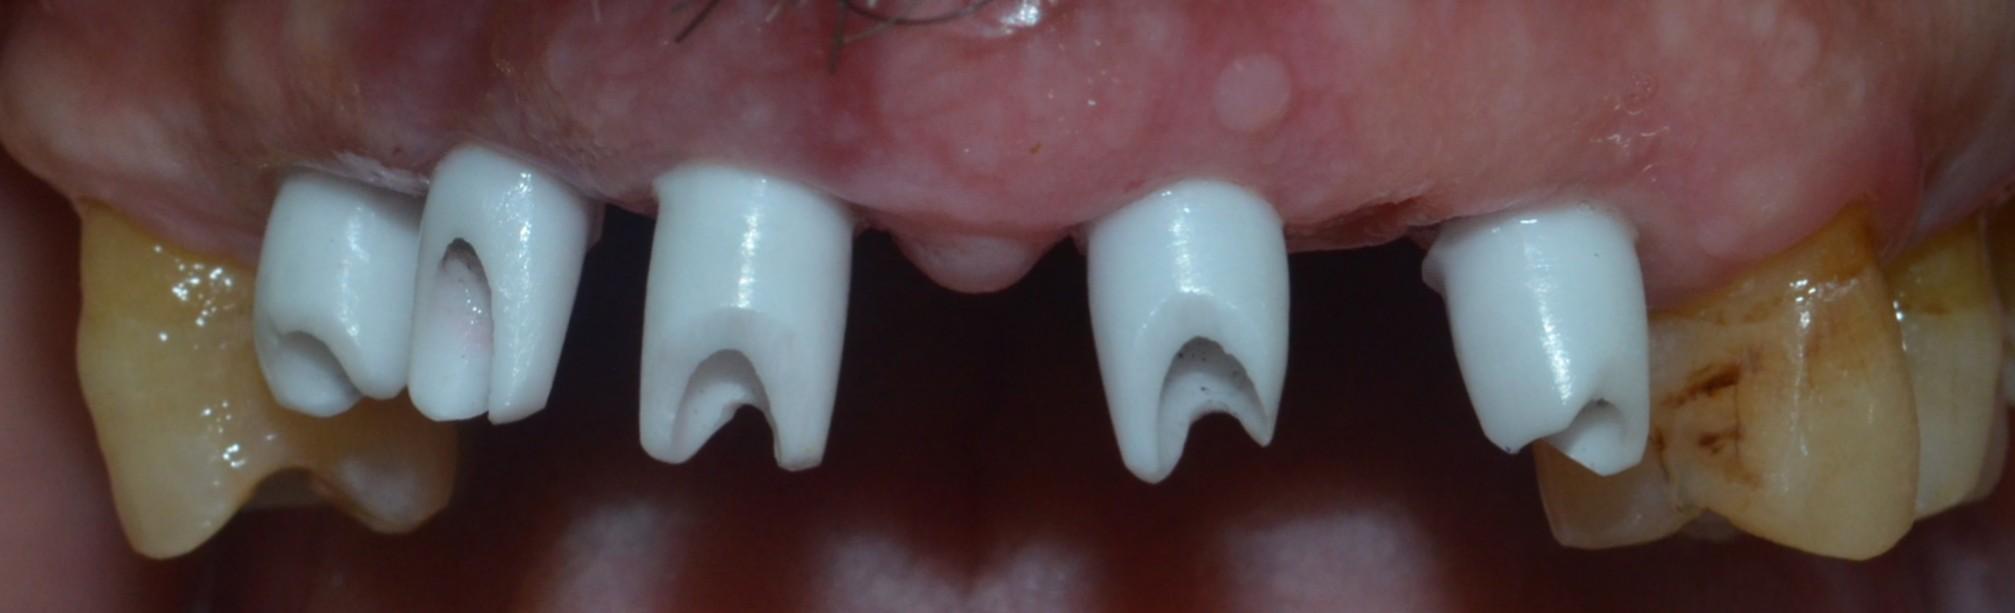 zirconia abutments on implants